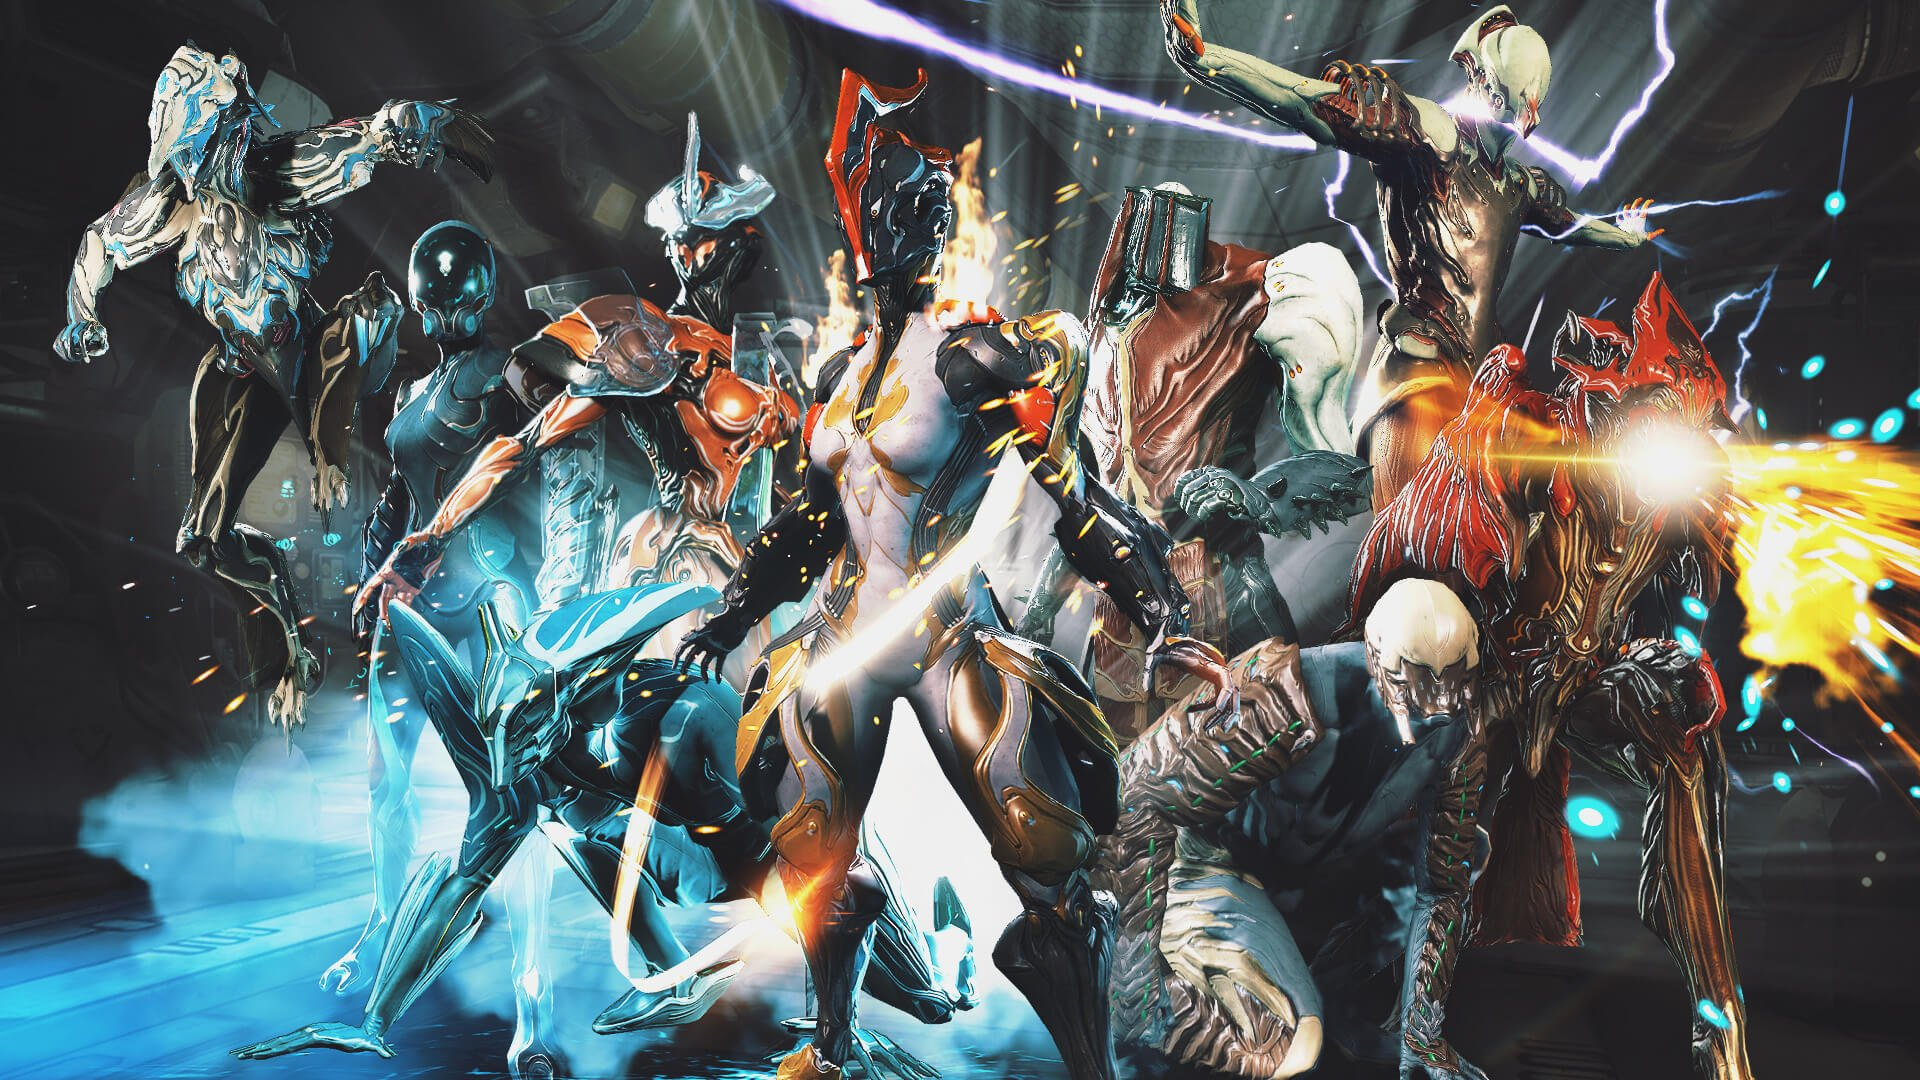 migliori free to play 2020 giochi free to play 2020 migliori giochi gratis 2020 MMO gratis MMORPG gratis warframe